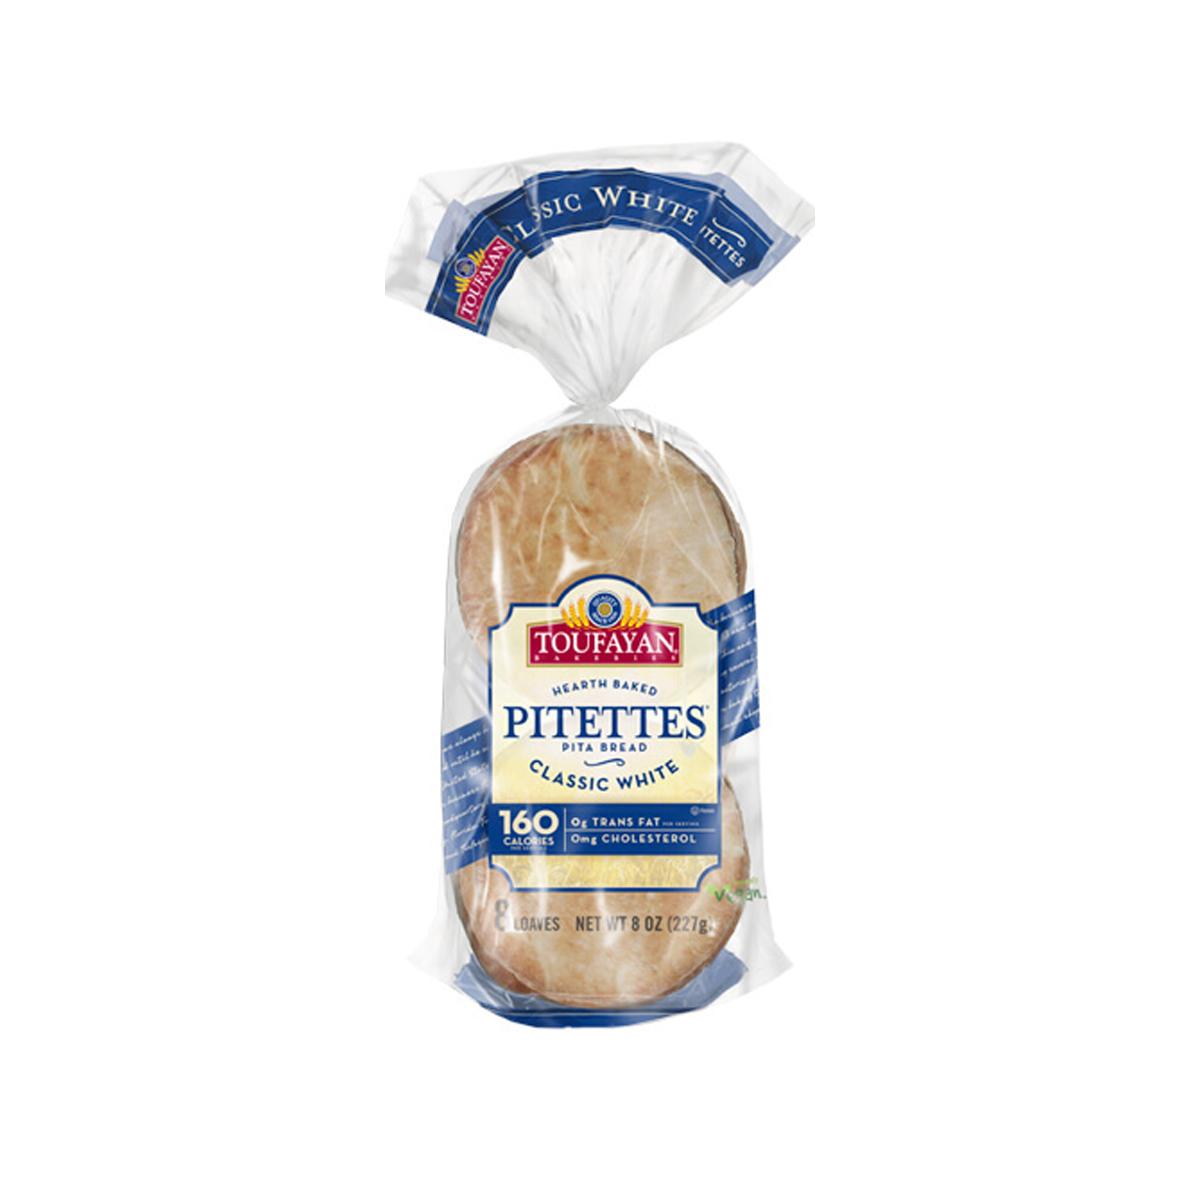 Pitette